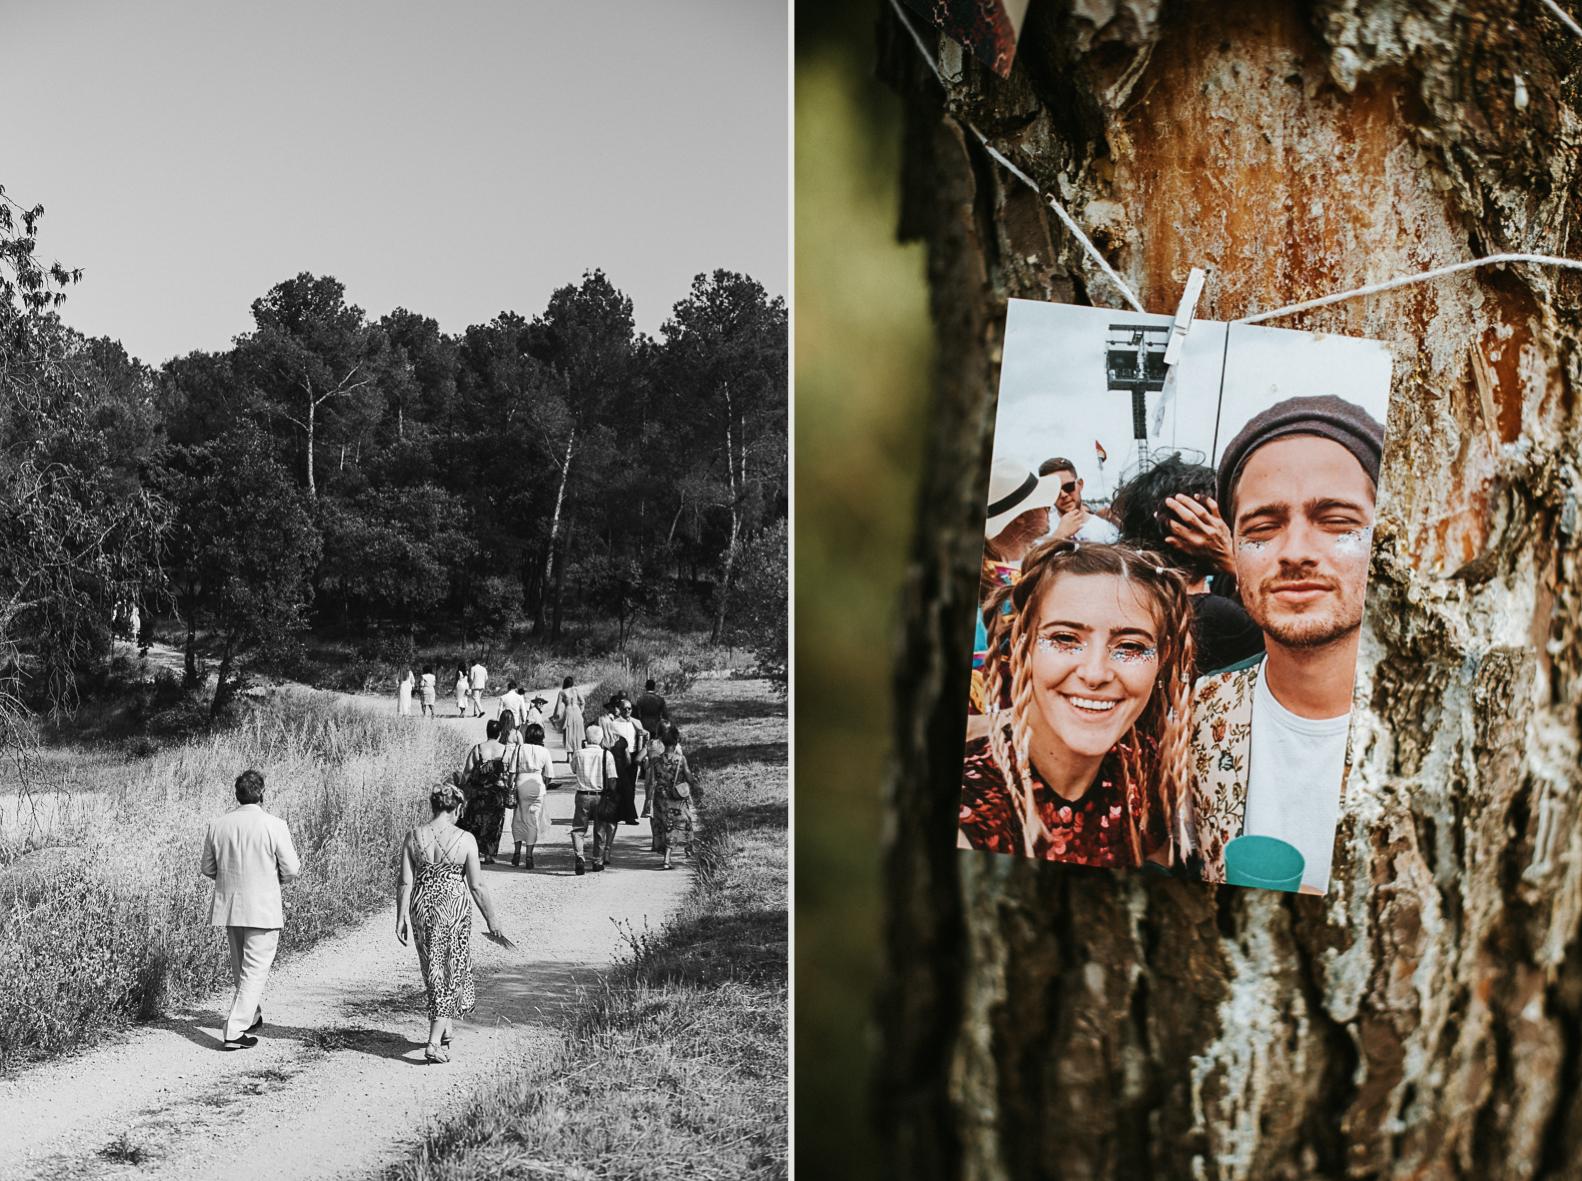 miks-sels-mas-terrats-girona-wedding-photographer-34.1